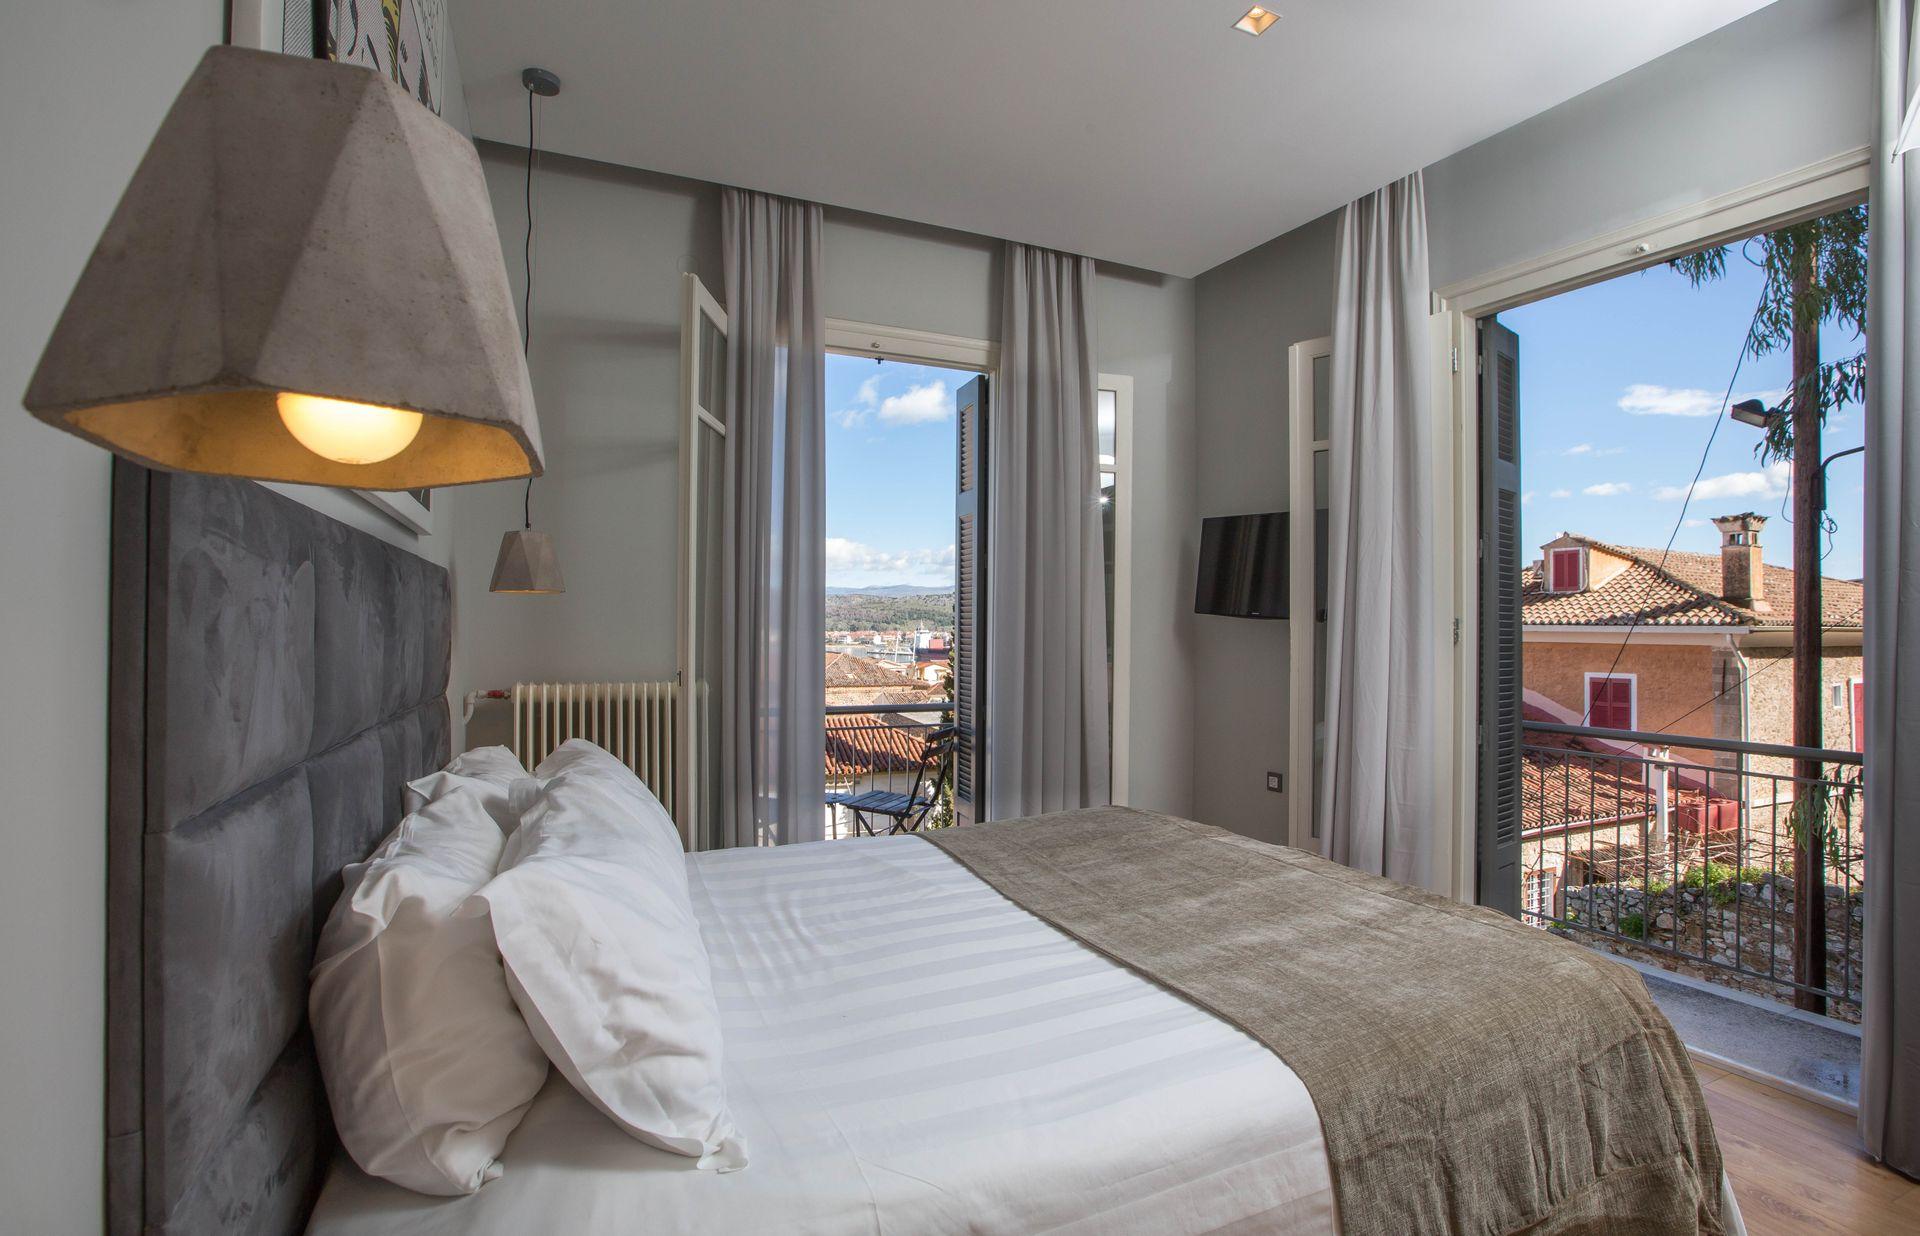 3* Leto Nuevo Hotel Nafplion | Ναύπλιο εικόνα